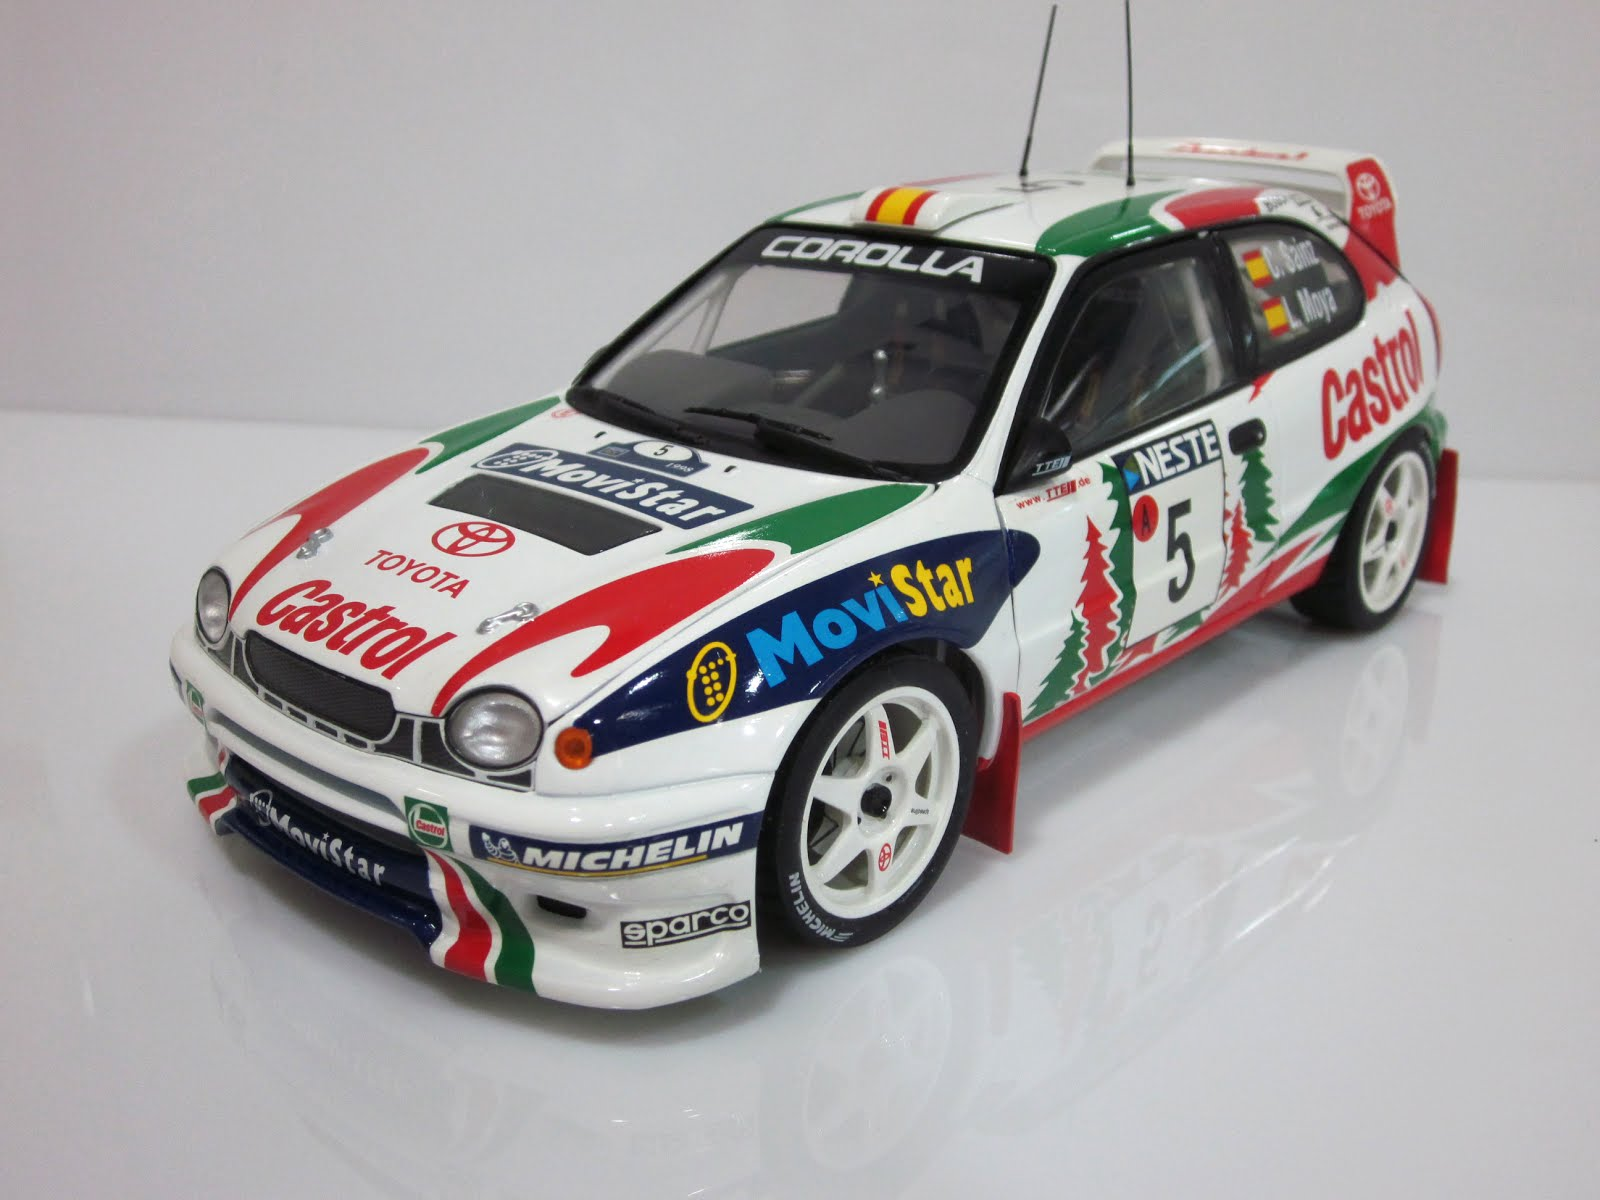 Toyota Corolla WRC - Finland Rally [C. Sainz / L. Moya] '98 - AUTOart